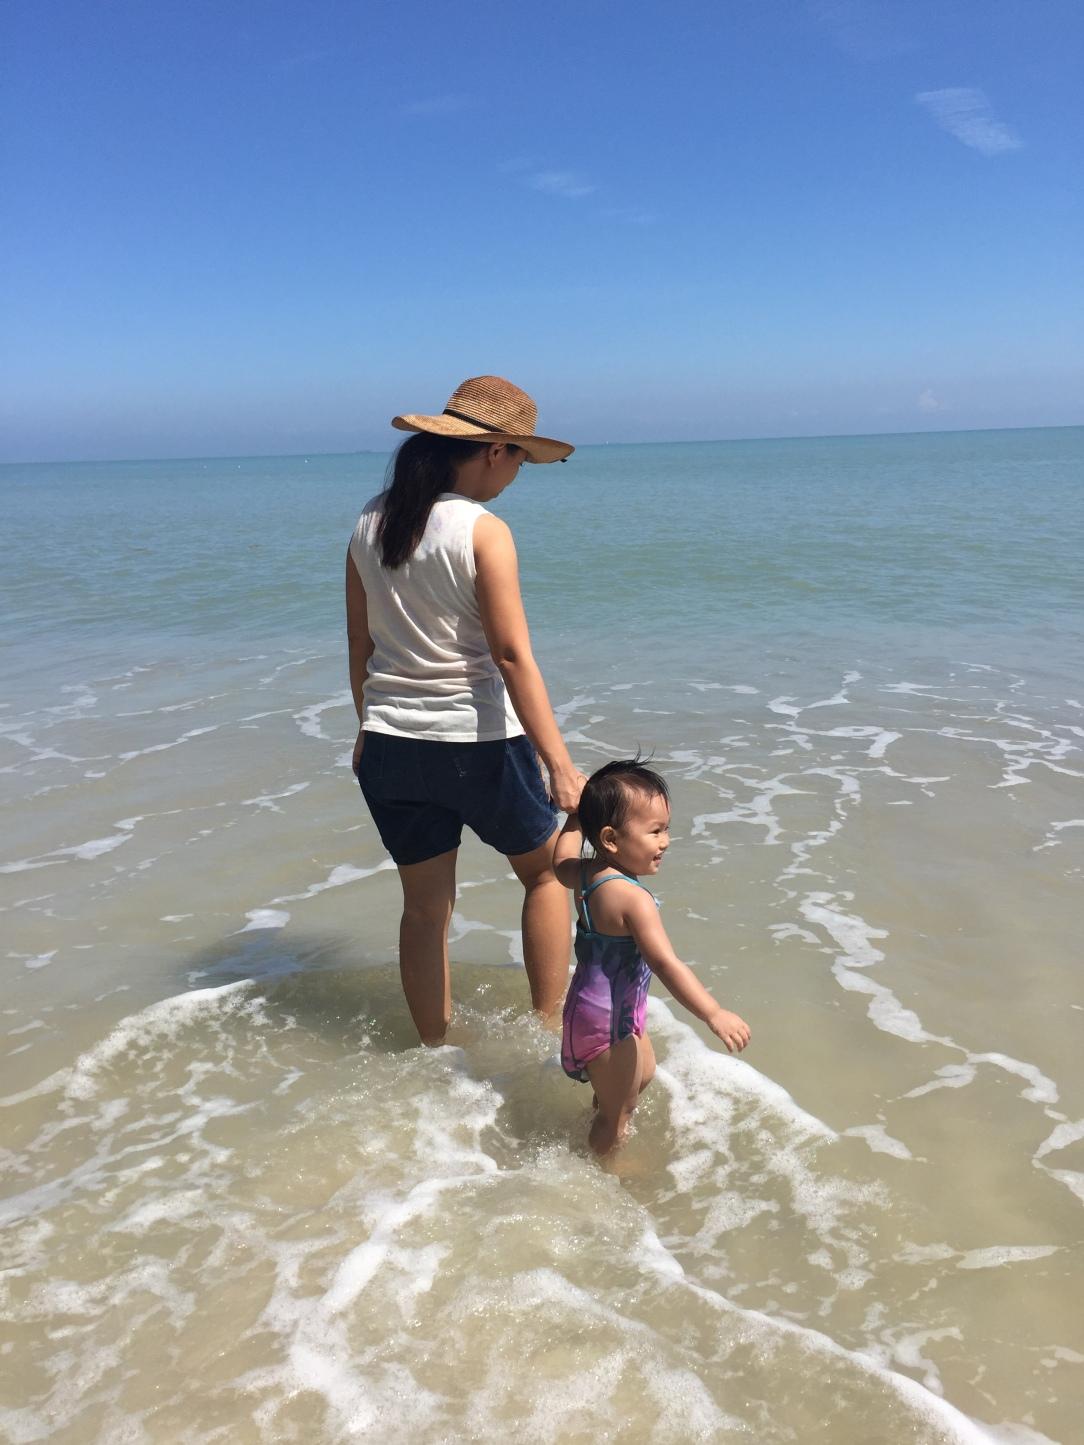 nature rich parenting, beach with toddler, penang beach, Vitamin N book review, richard louv